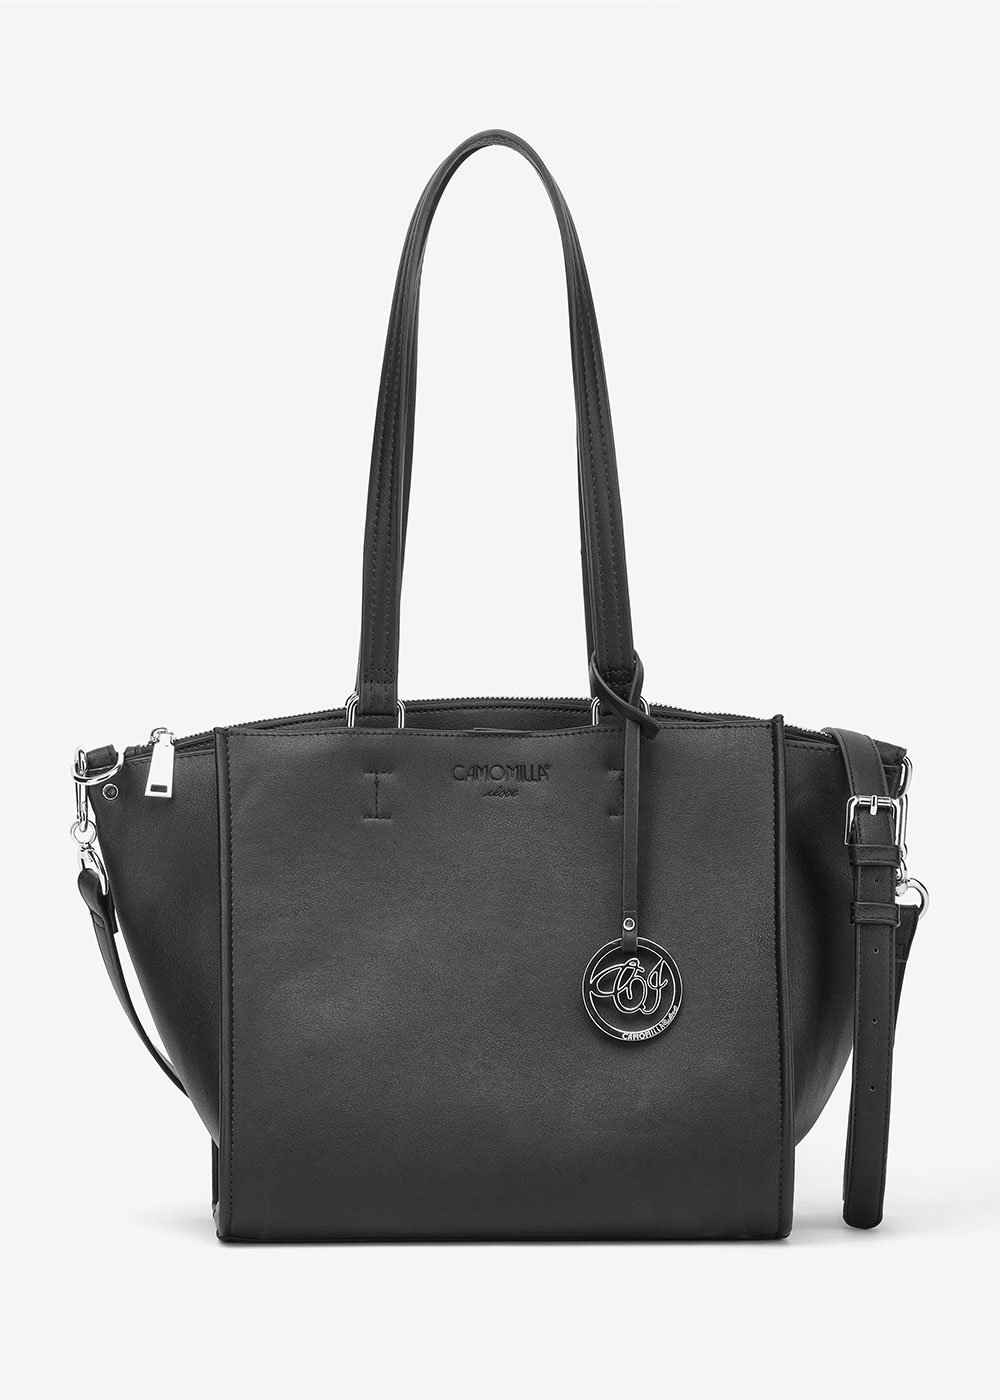 Shopping bag Baloo manici lunghi - Black - Donna